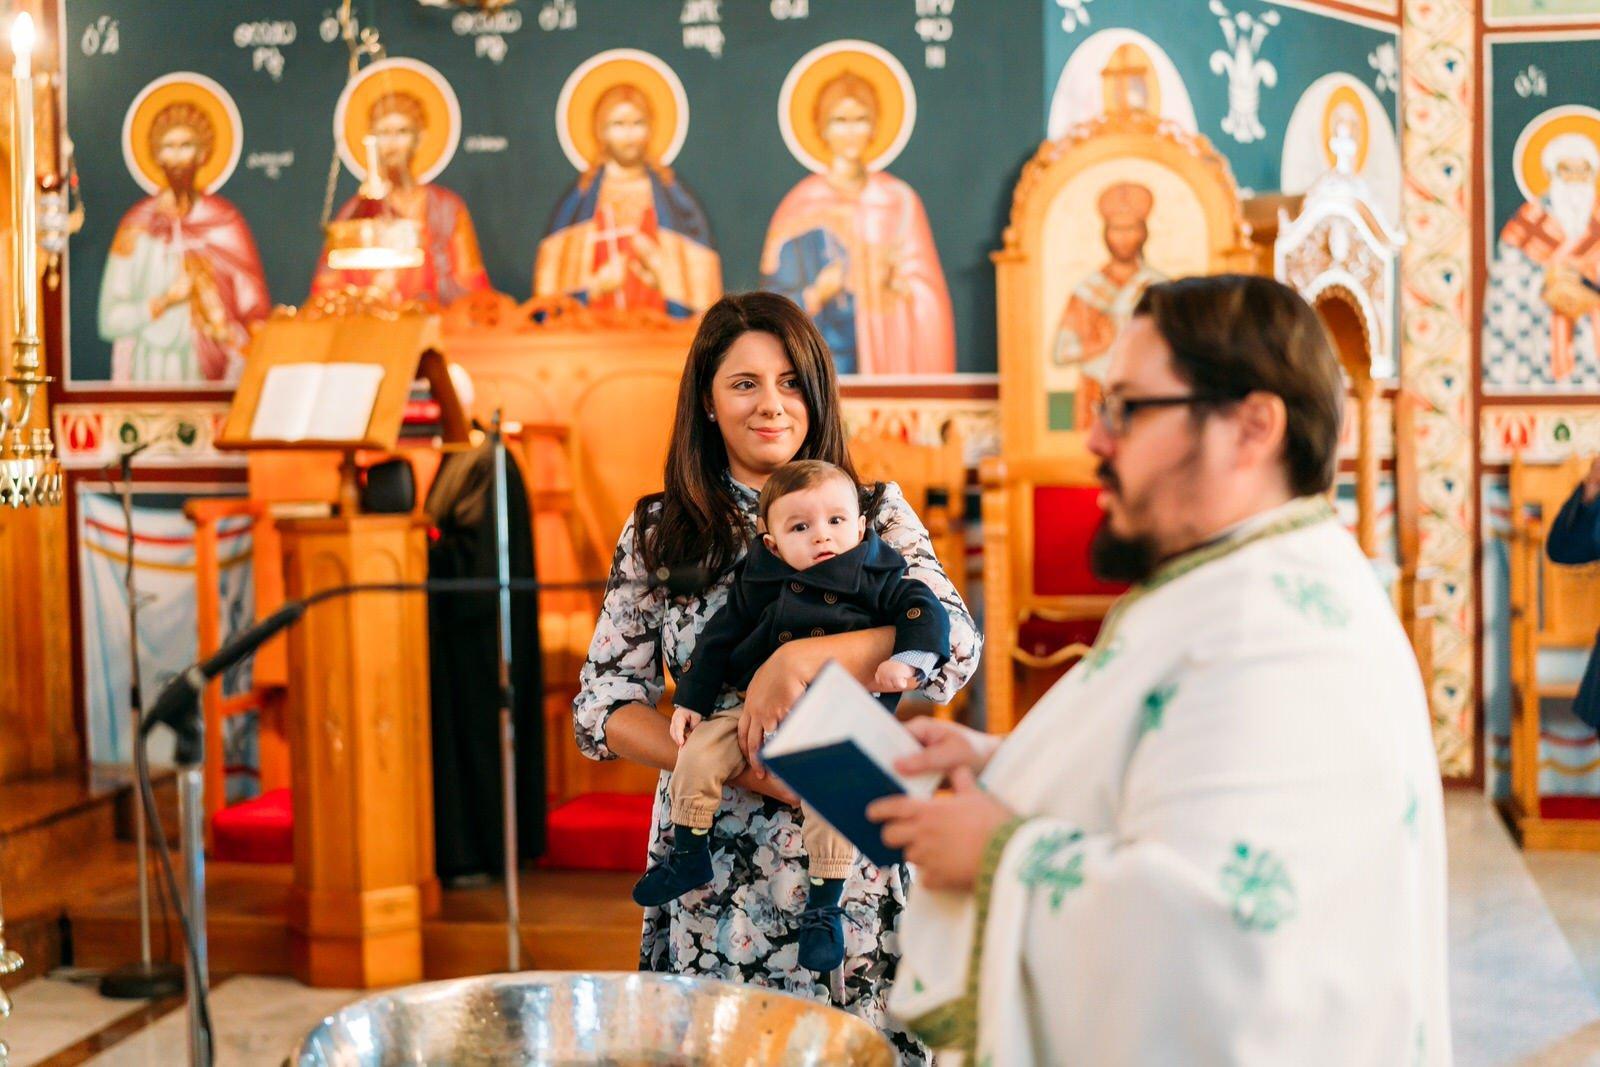 yianni-baptism-st-catherine-orthodox-mascot-laqua-66